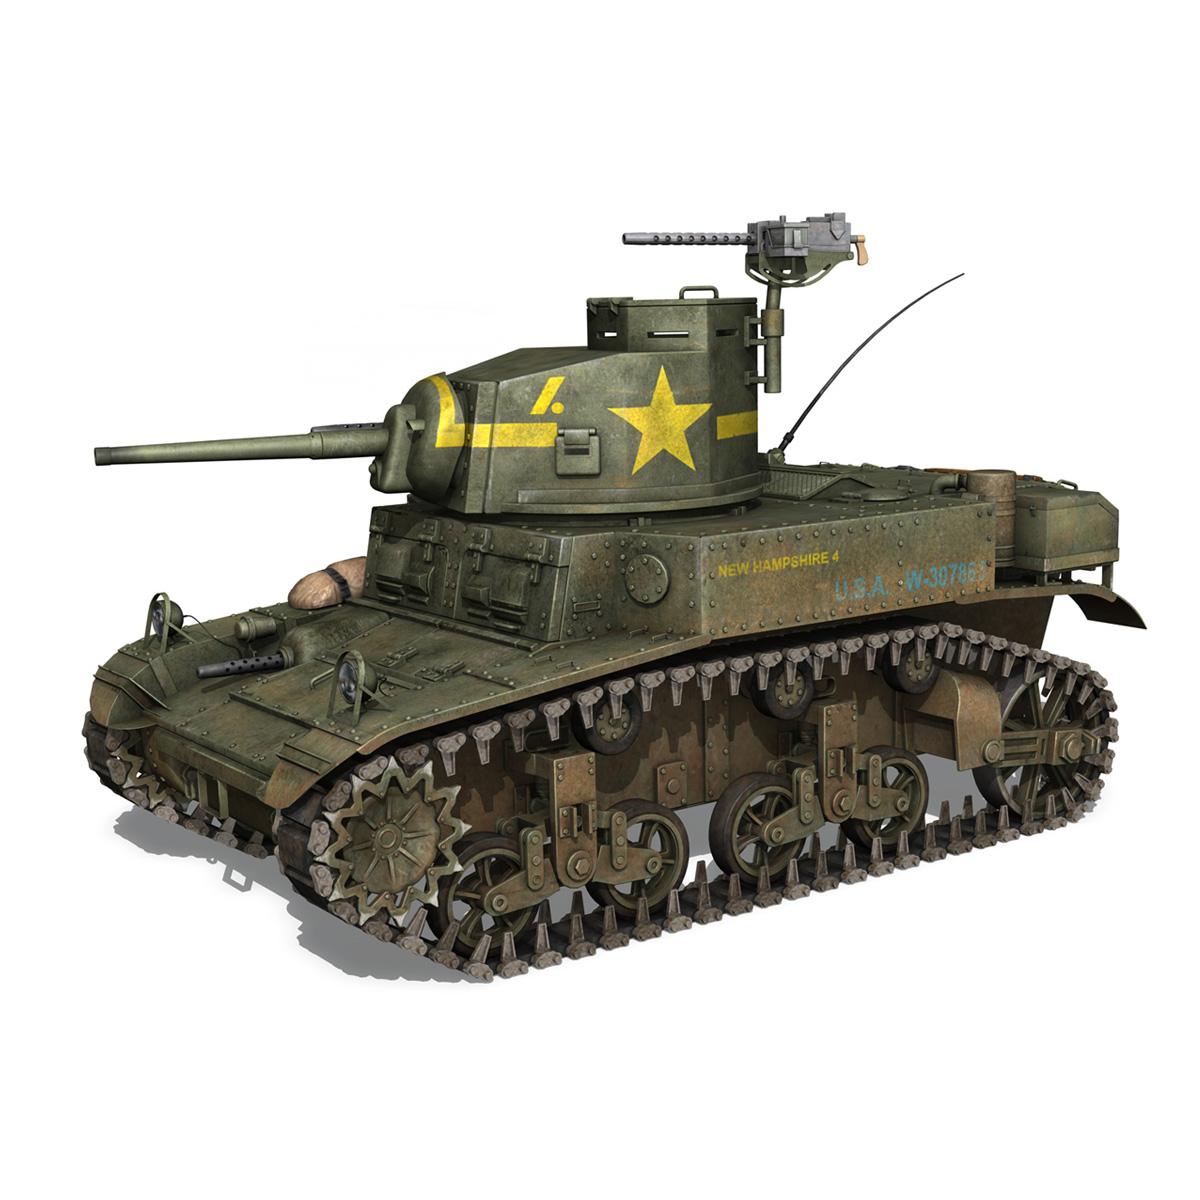 m3 light tank stuart – new hampshire 4 3d model 3ds c4d fbx lwo lw lws obj 266375